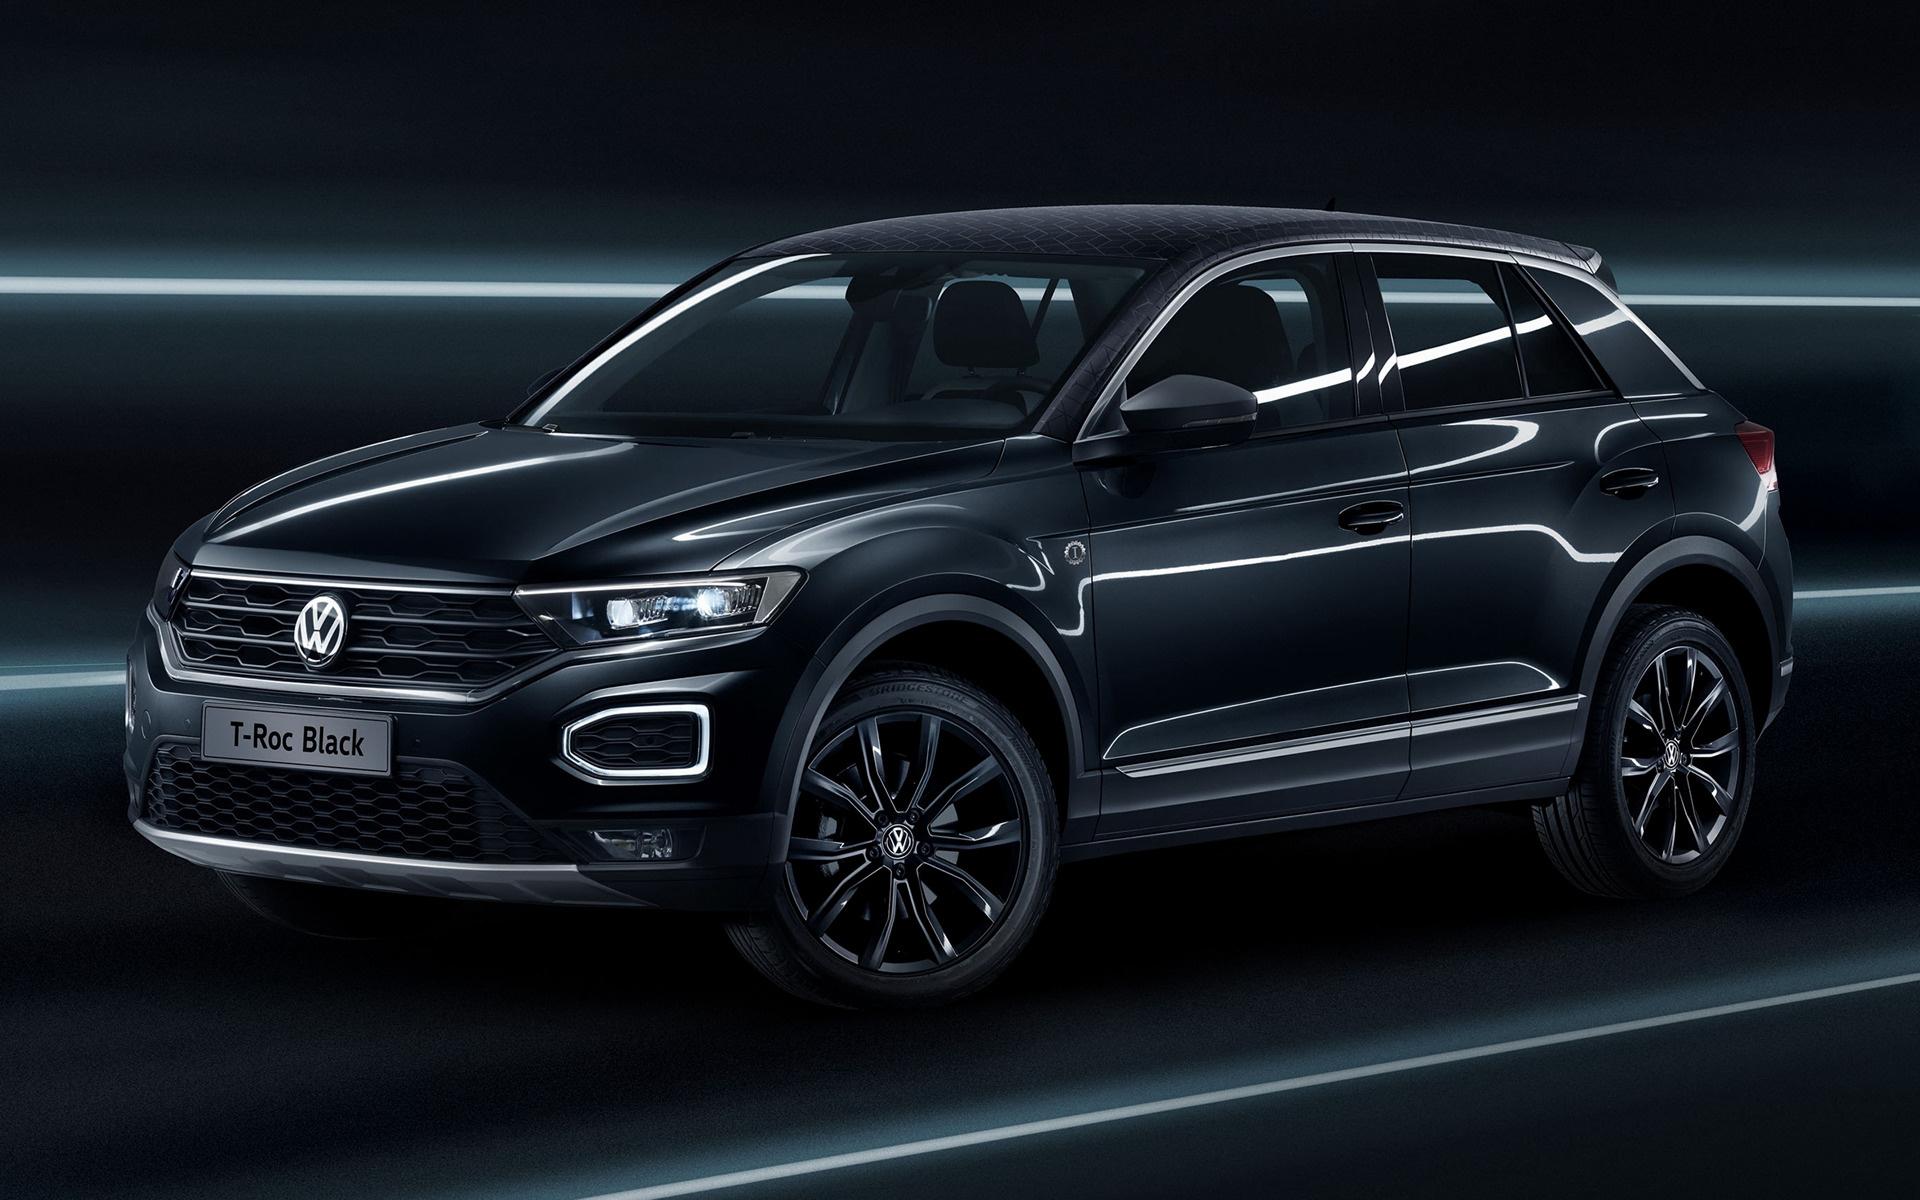 2017 Volkswagen T Roc Black Wallpapers And HD Images